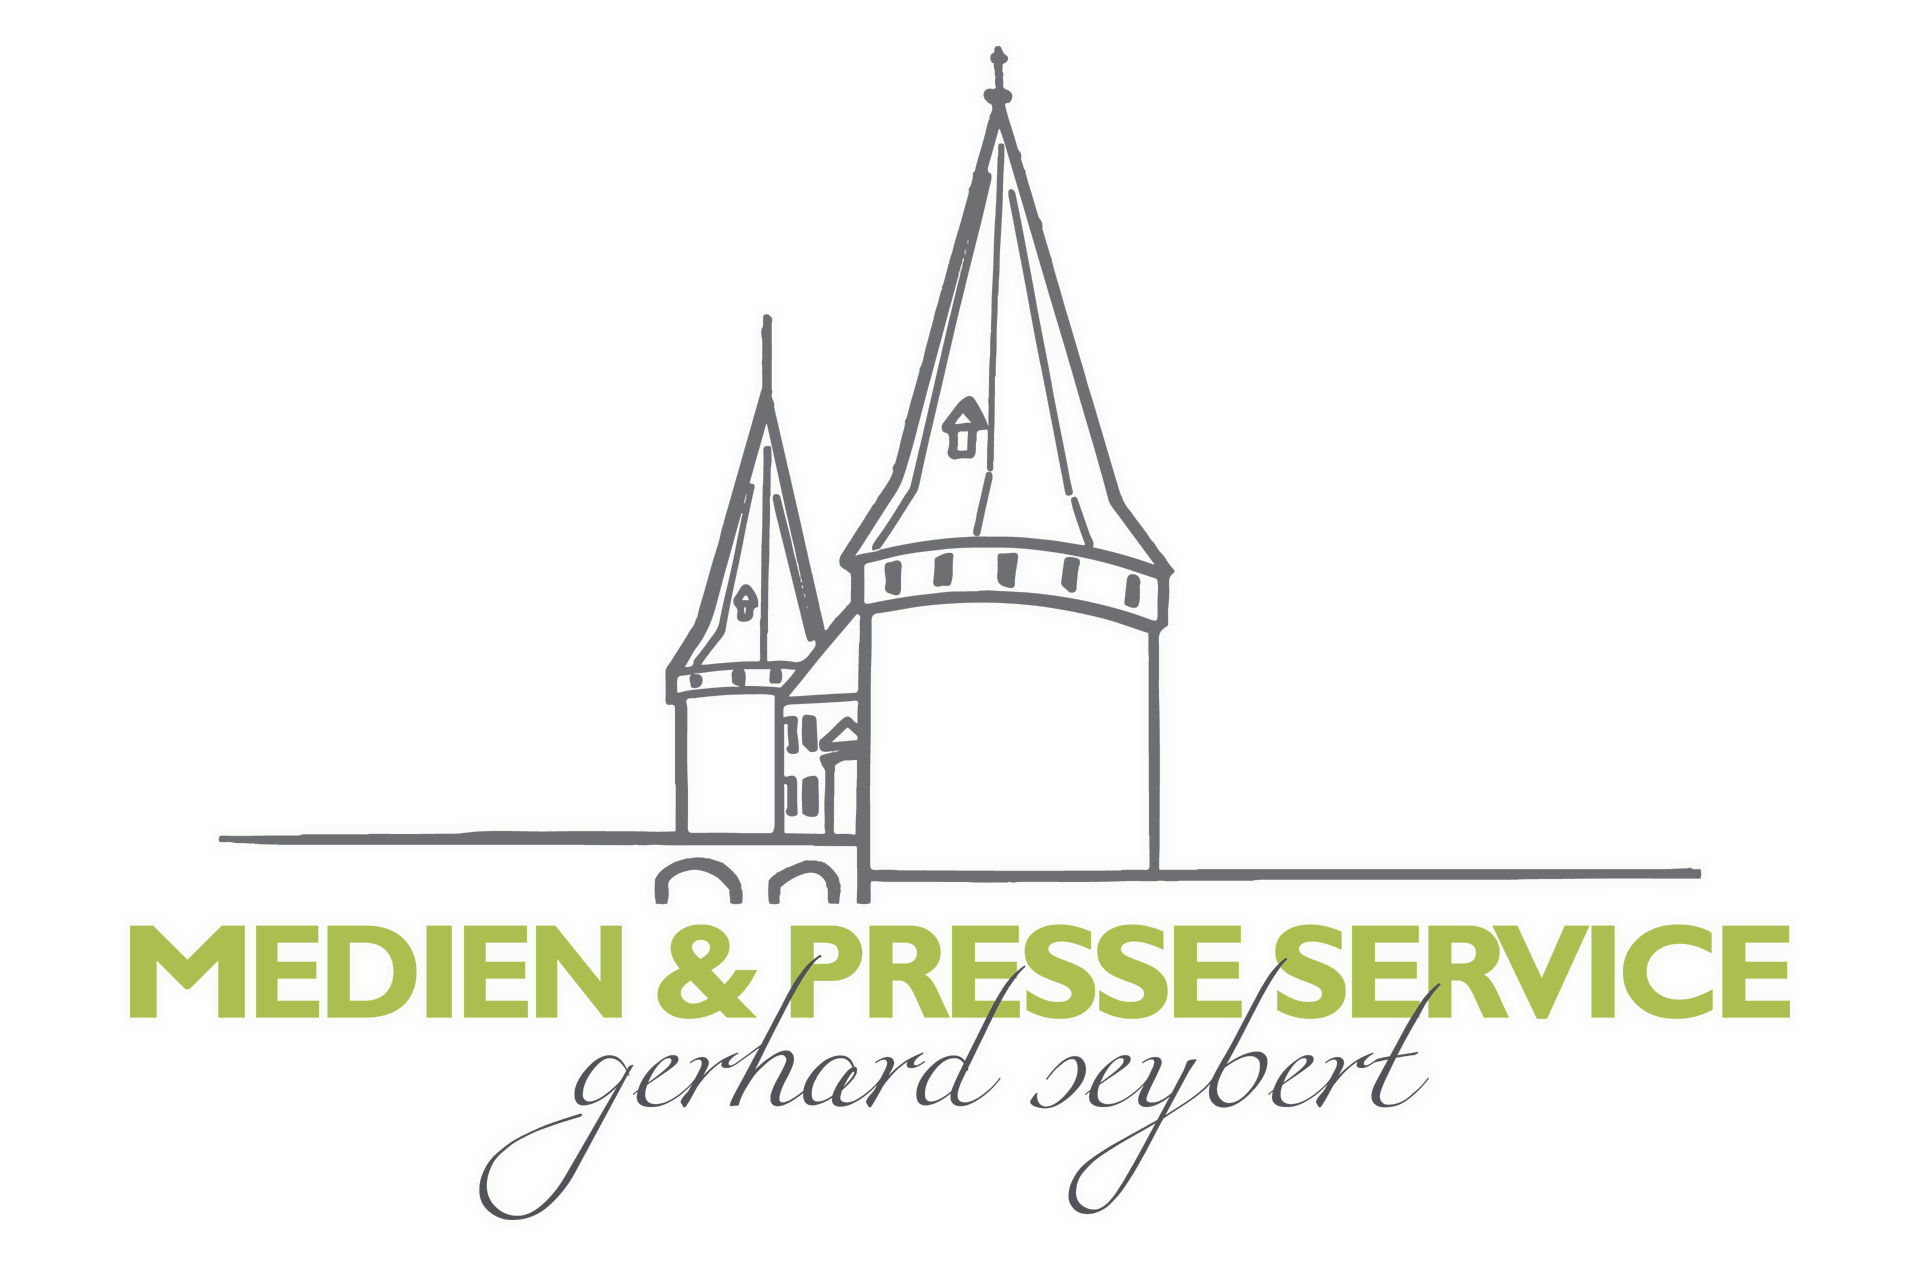 medien & Presse Service Gerhard Seybert